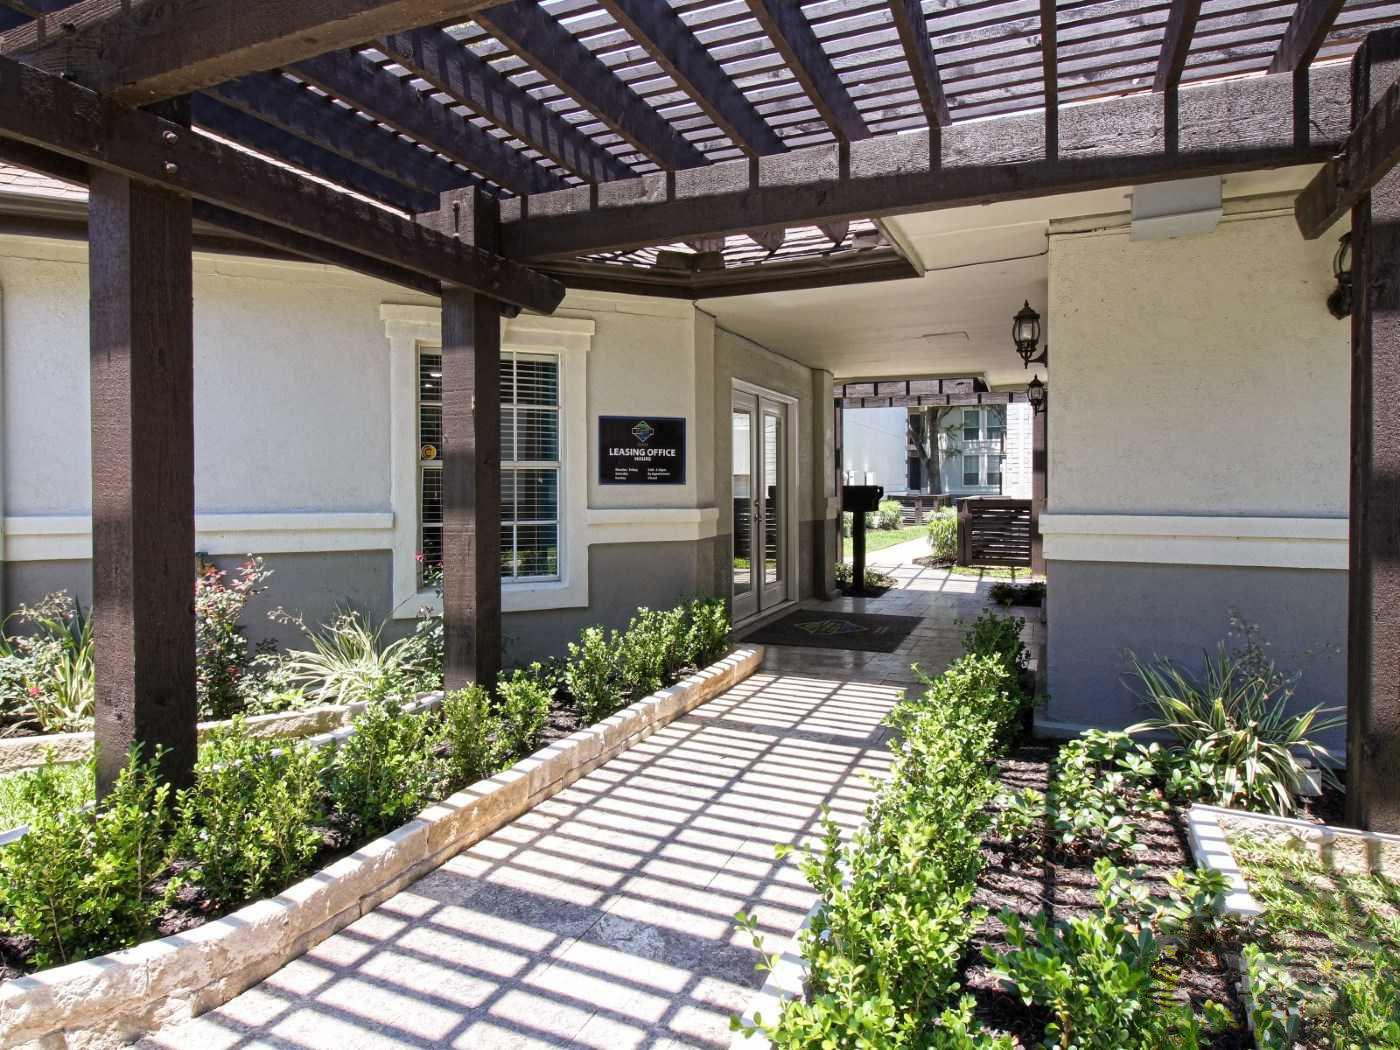 Seabrook Apartment Rentals at La Maison at Lake Cove Apartments in Seabrook, Texas